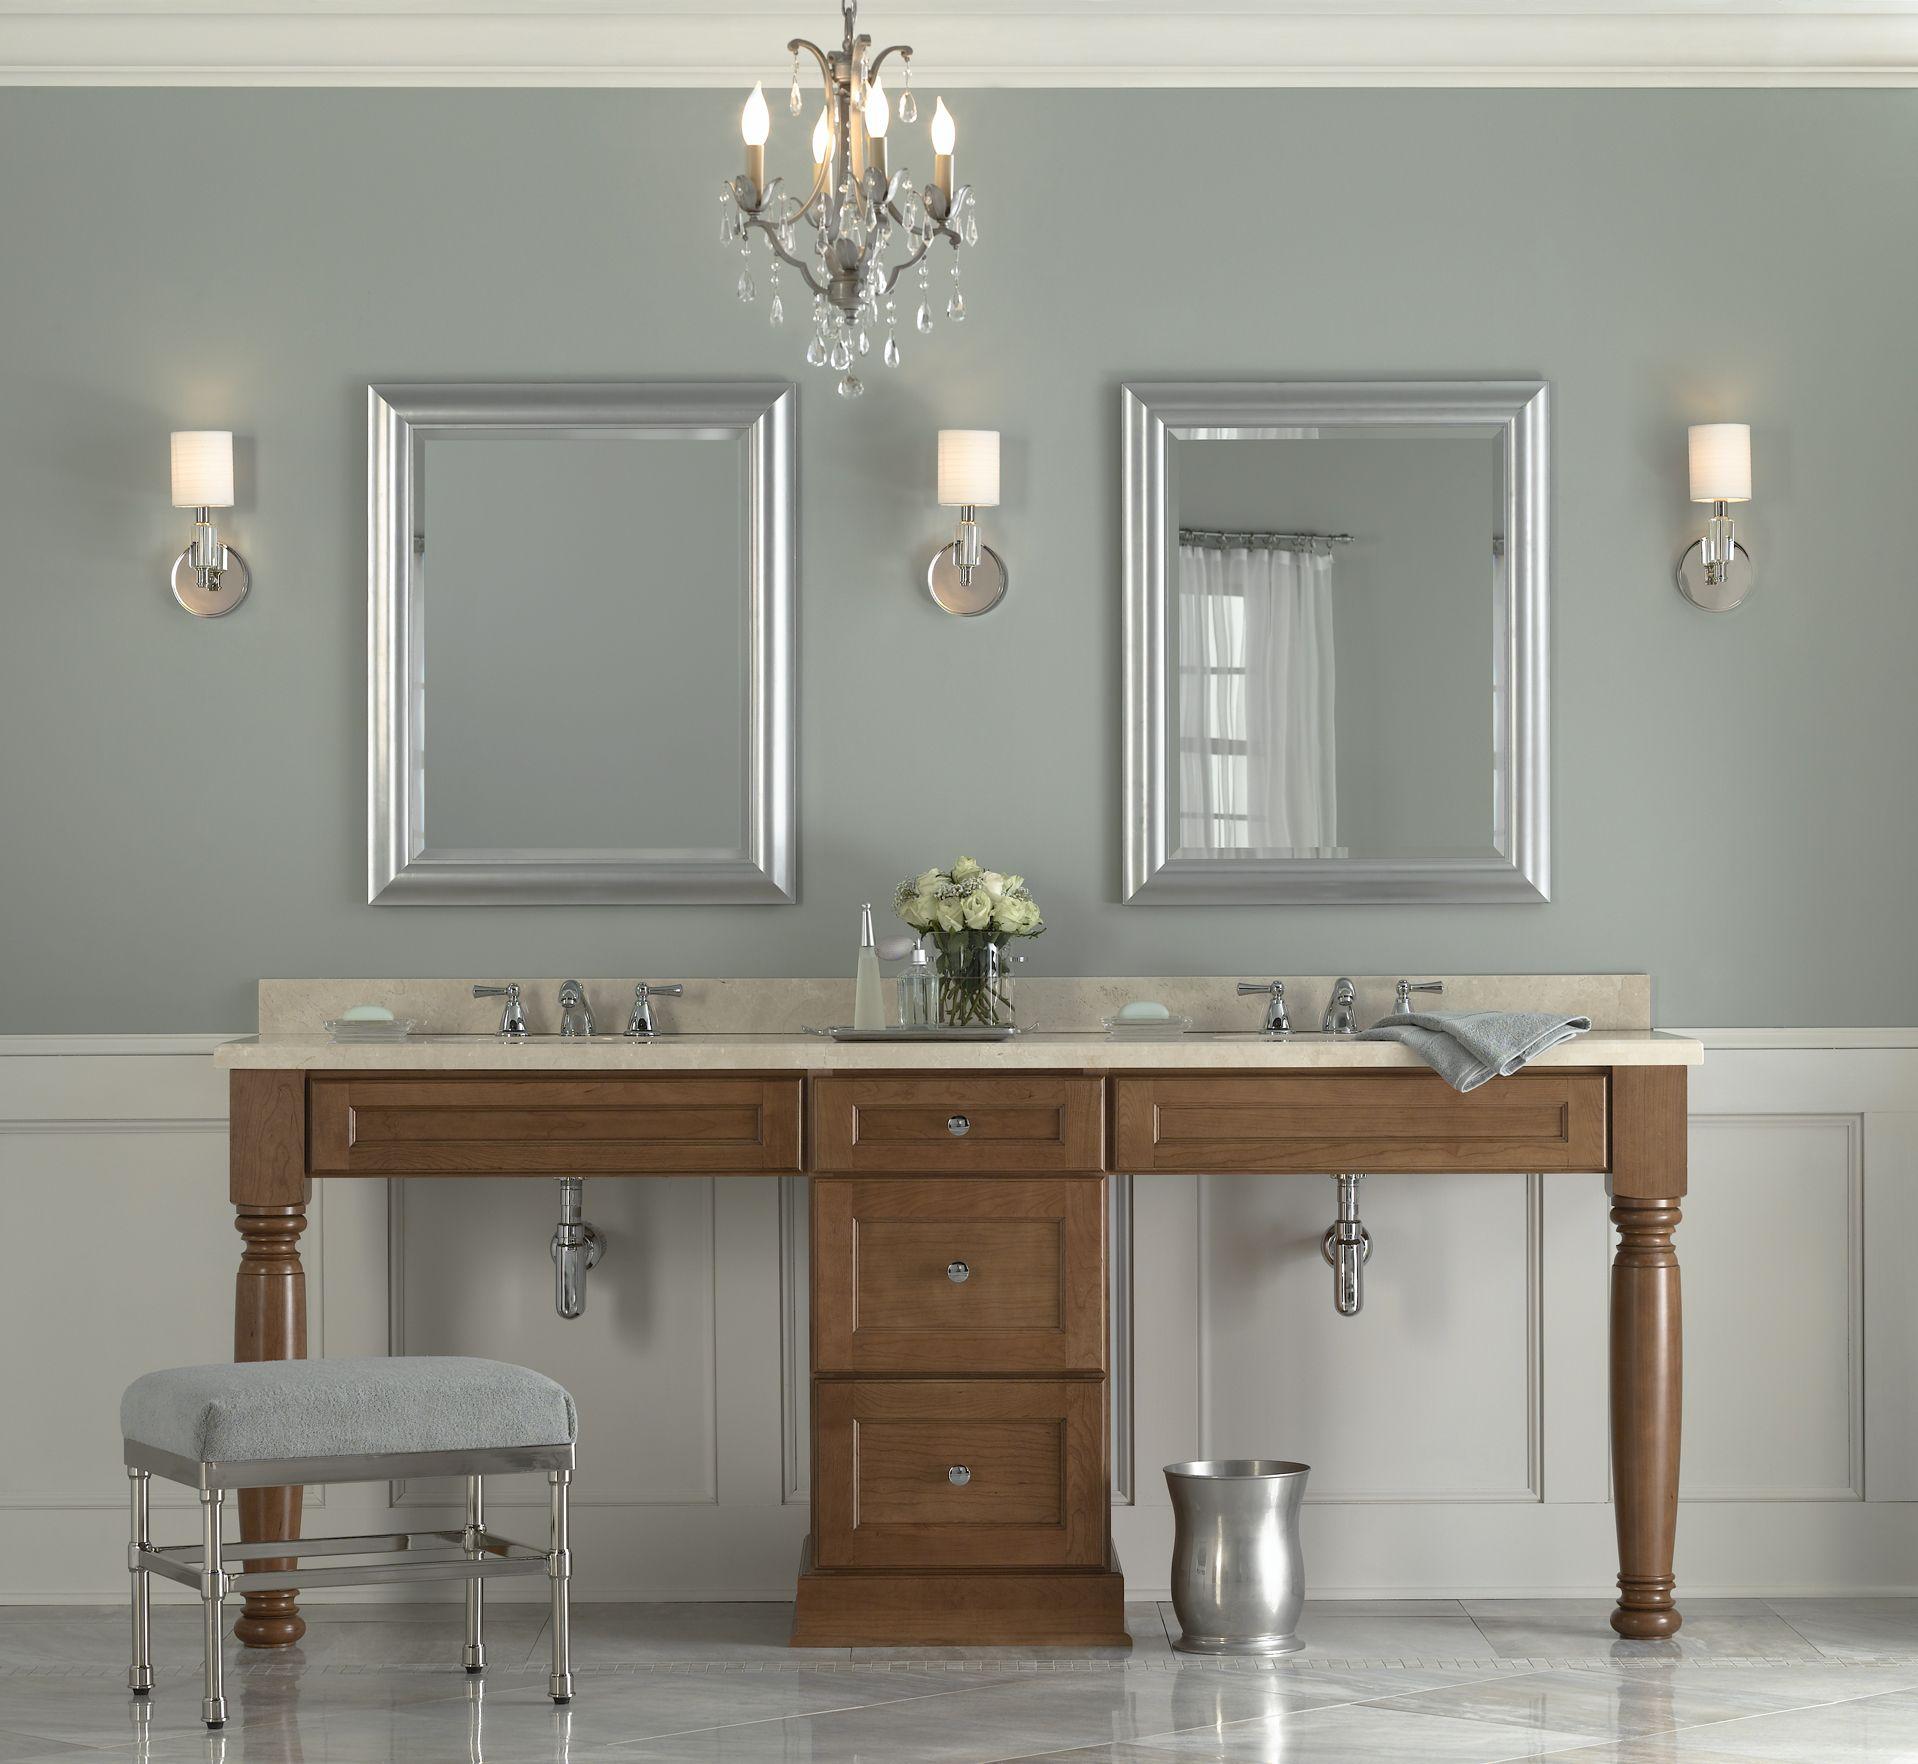 Bathroom Design Denver Adorable Hickory Hartford Harvest Stain With Chocolate Glaze Decorating Inspiration